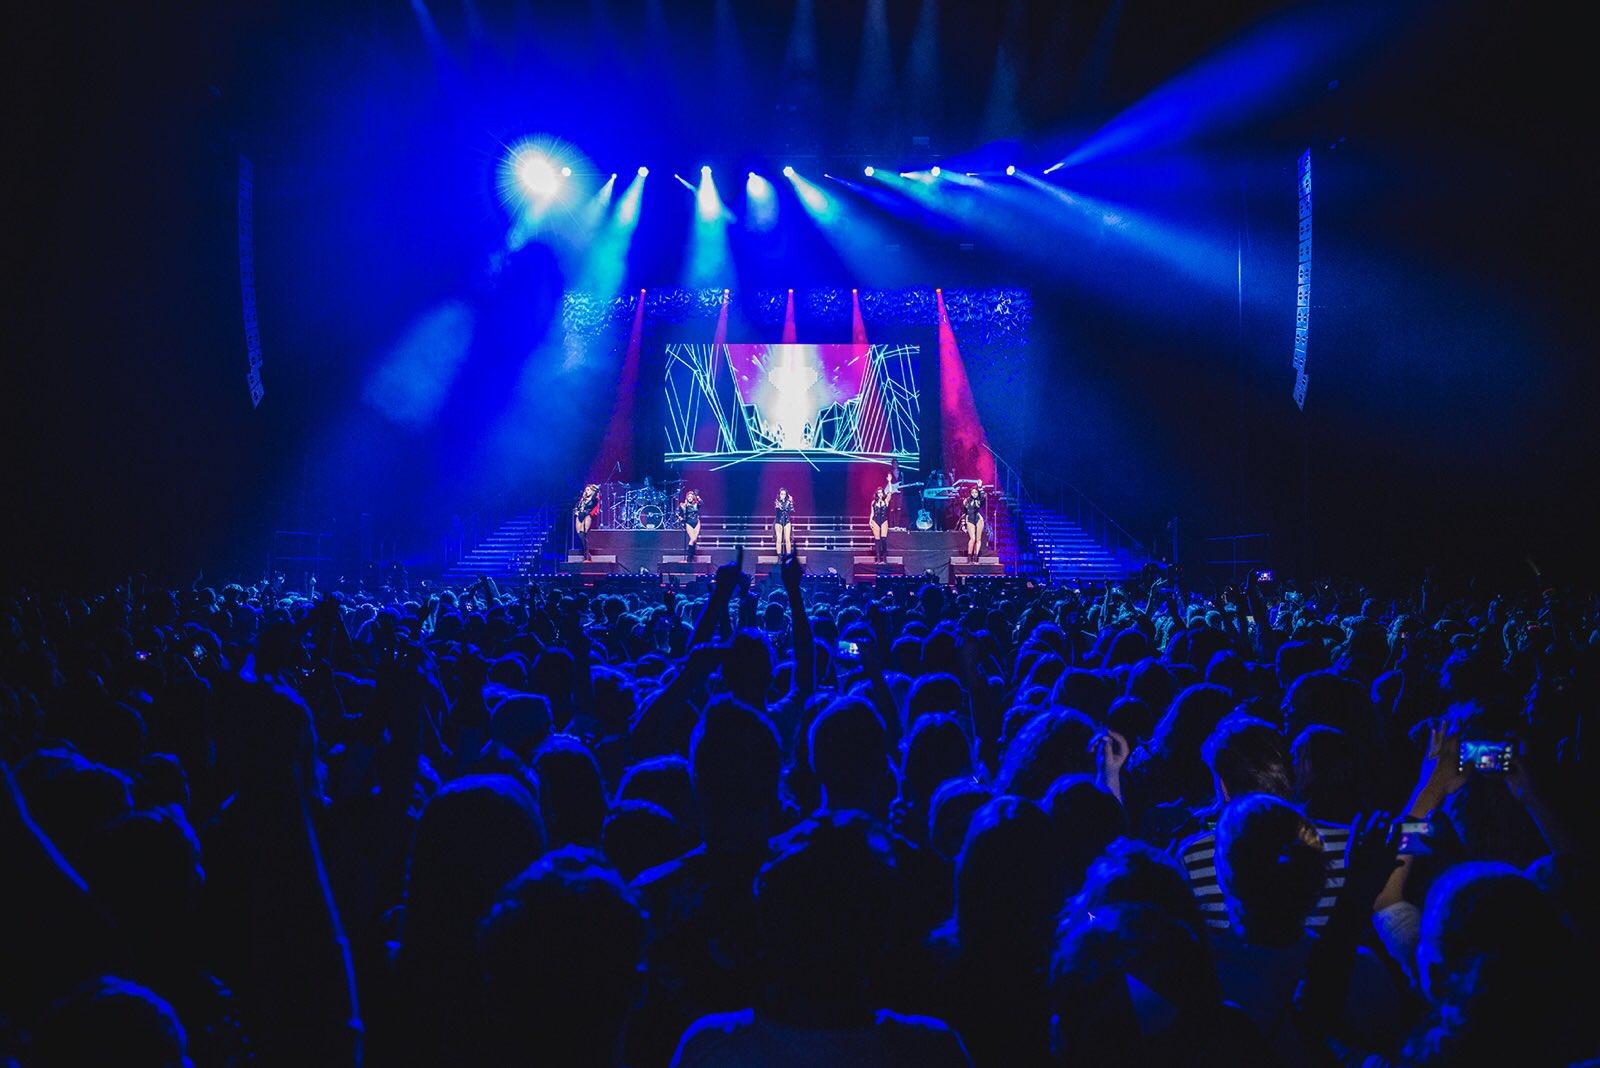 Thank you all for an amazing night! ����#727TourAmsterdam https://t.co/AwOHgZSlCF